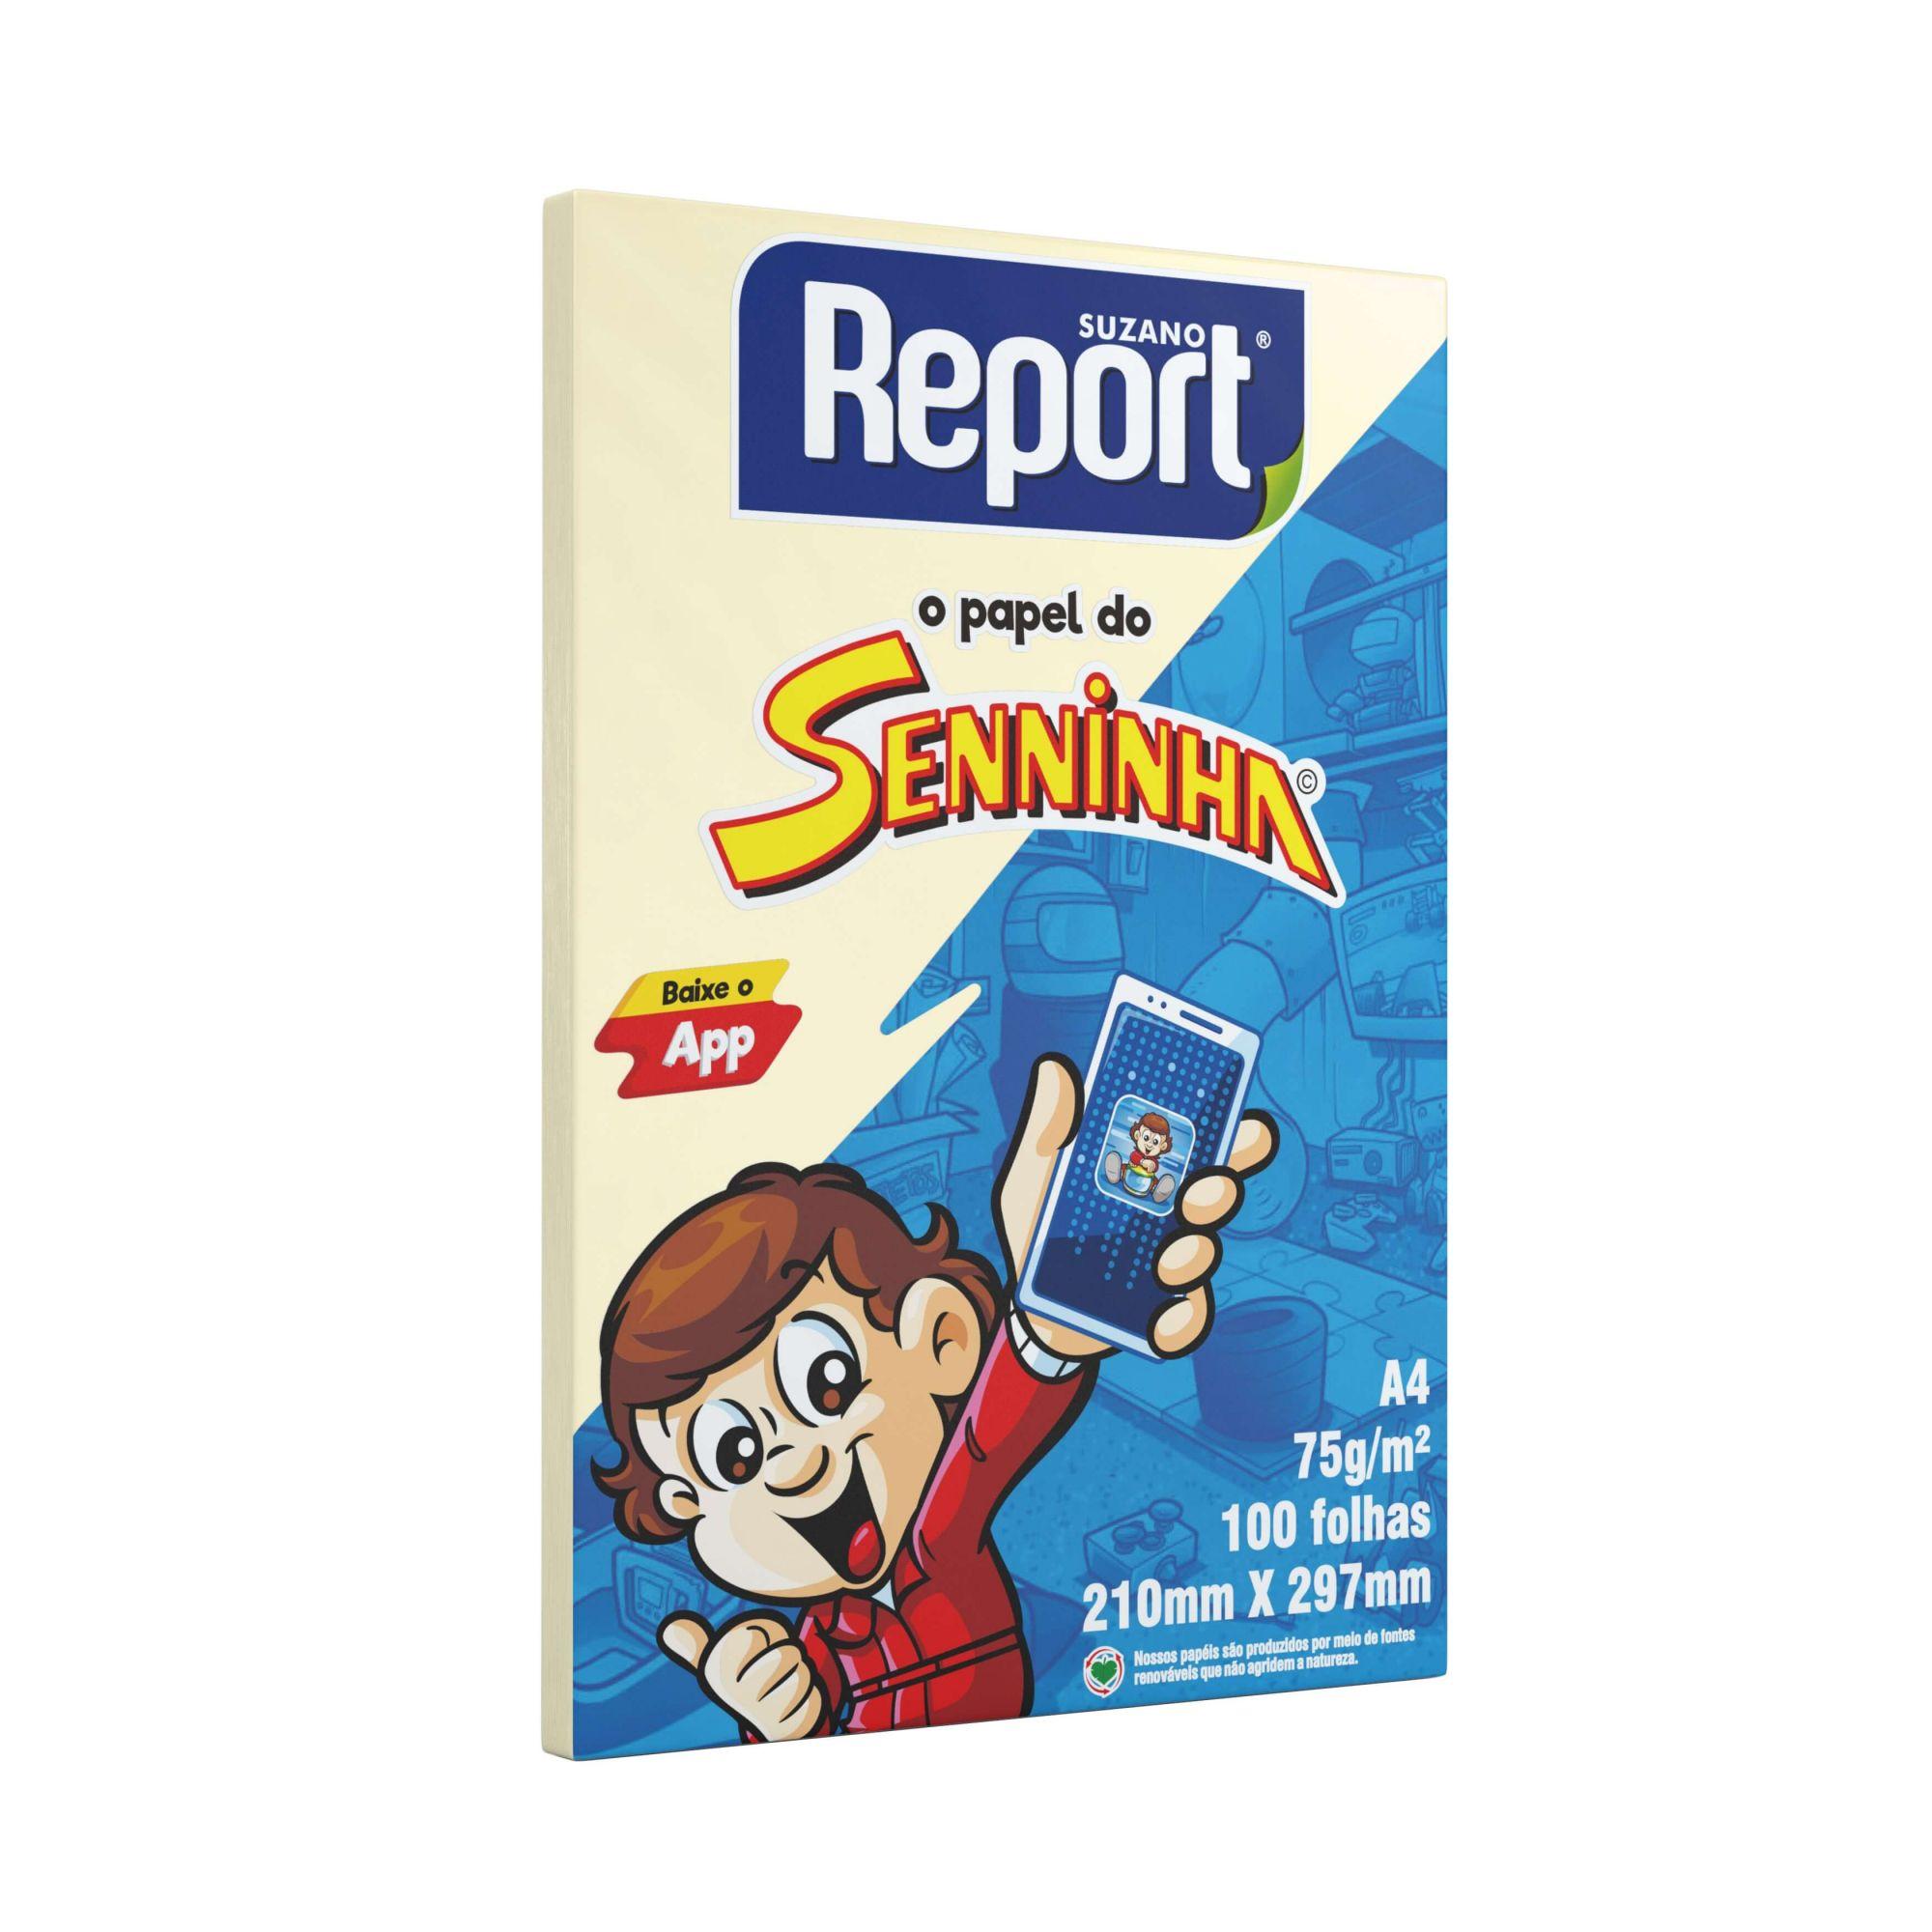 O Papel do Senninha - Suzano